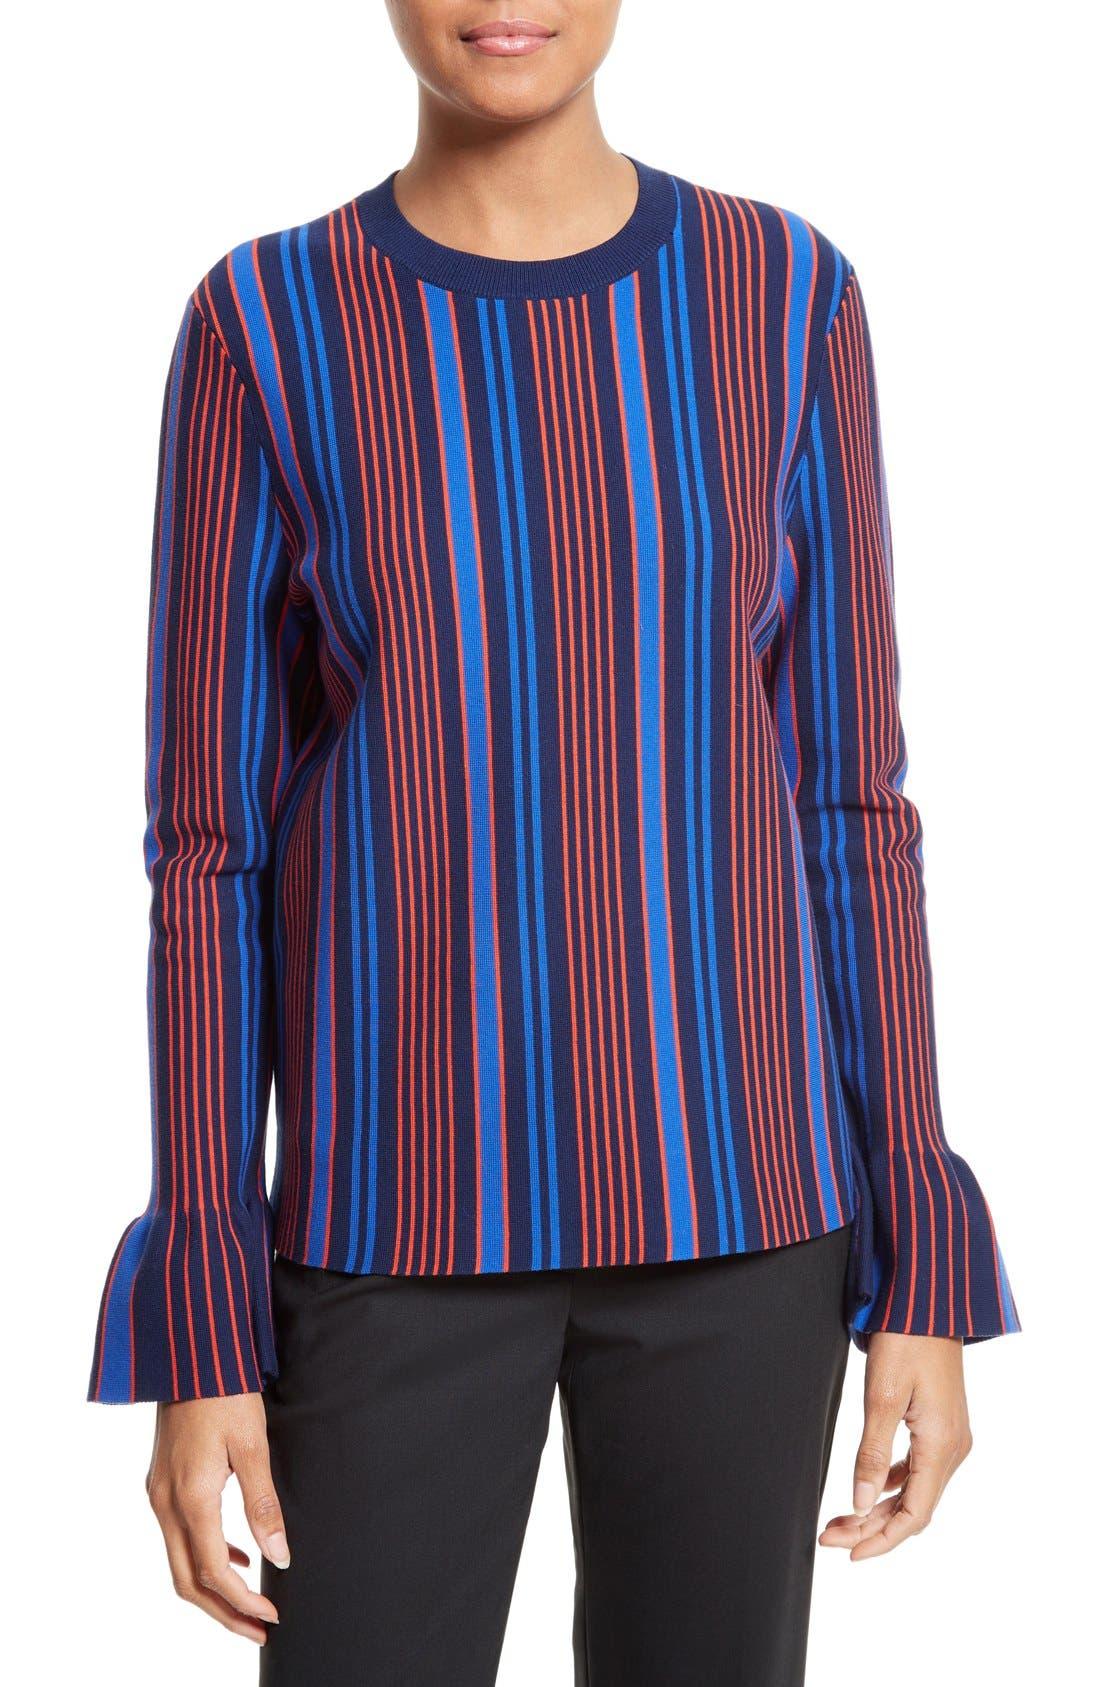 Tory Burch Lindo Flare Cuff Sweater